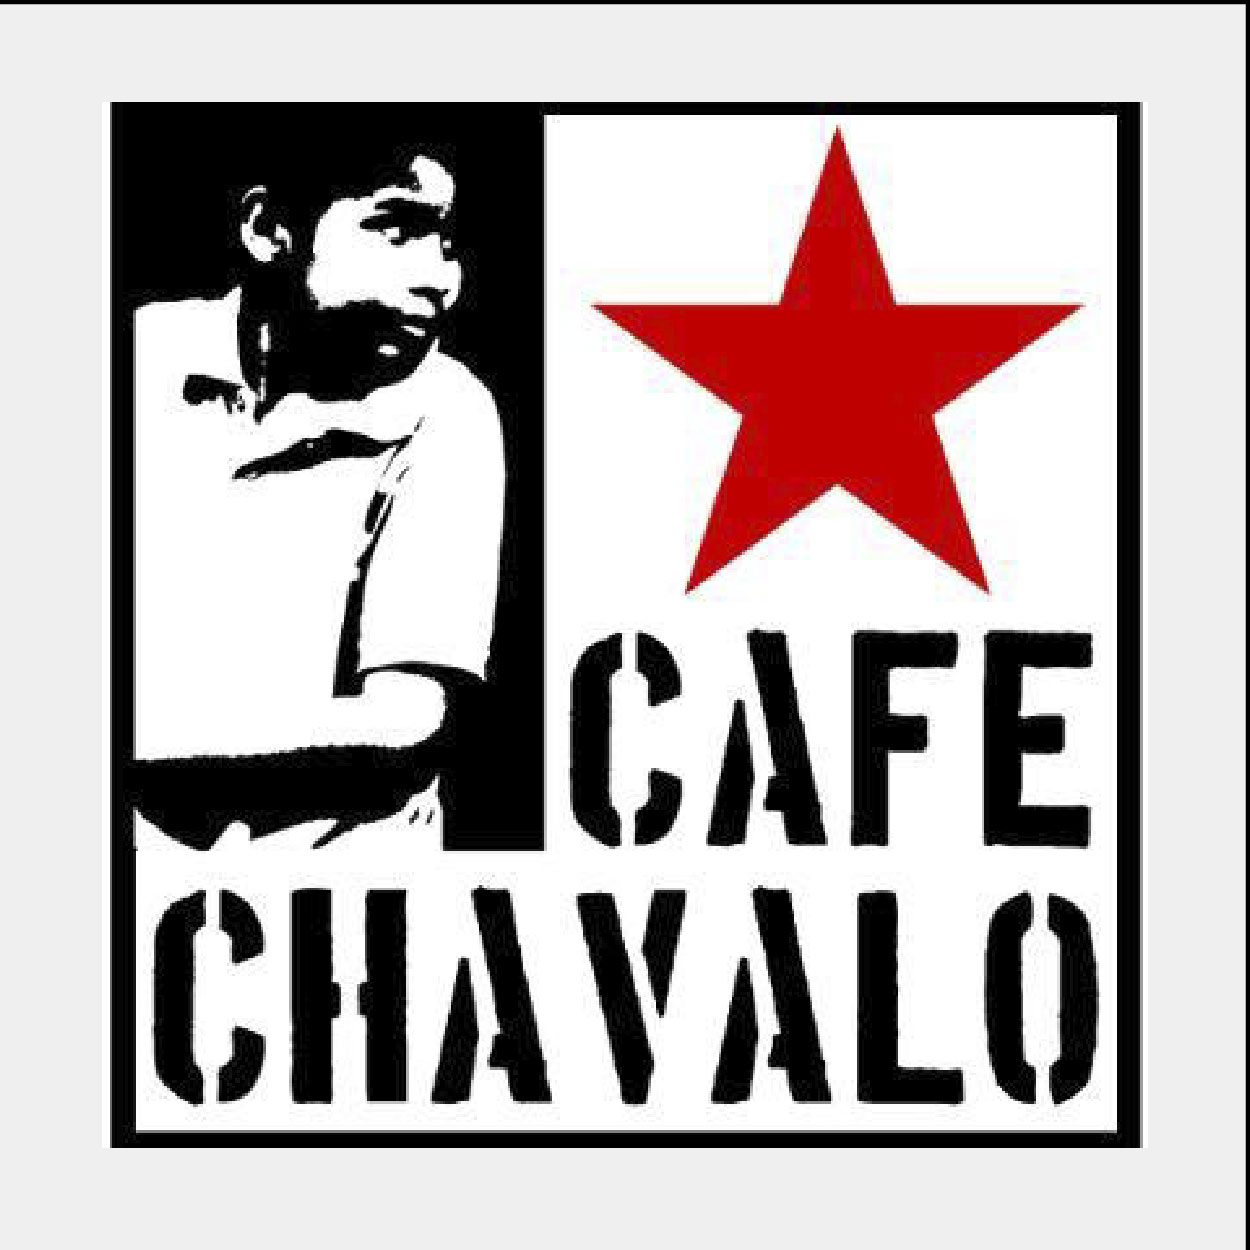 chavalo-01